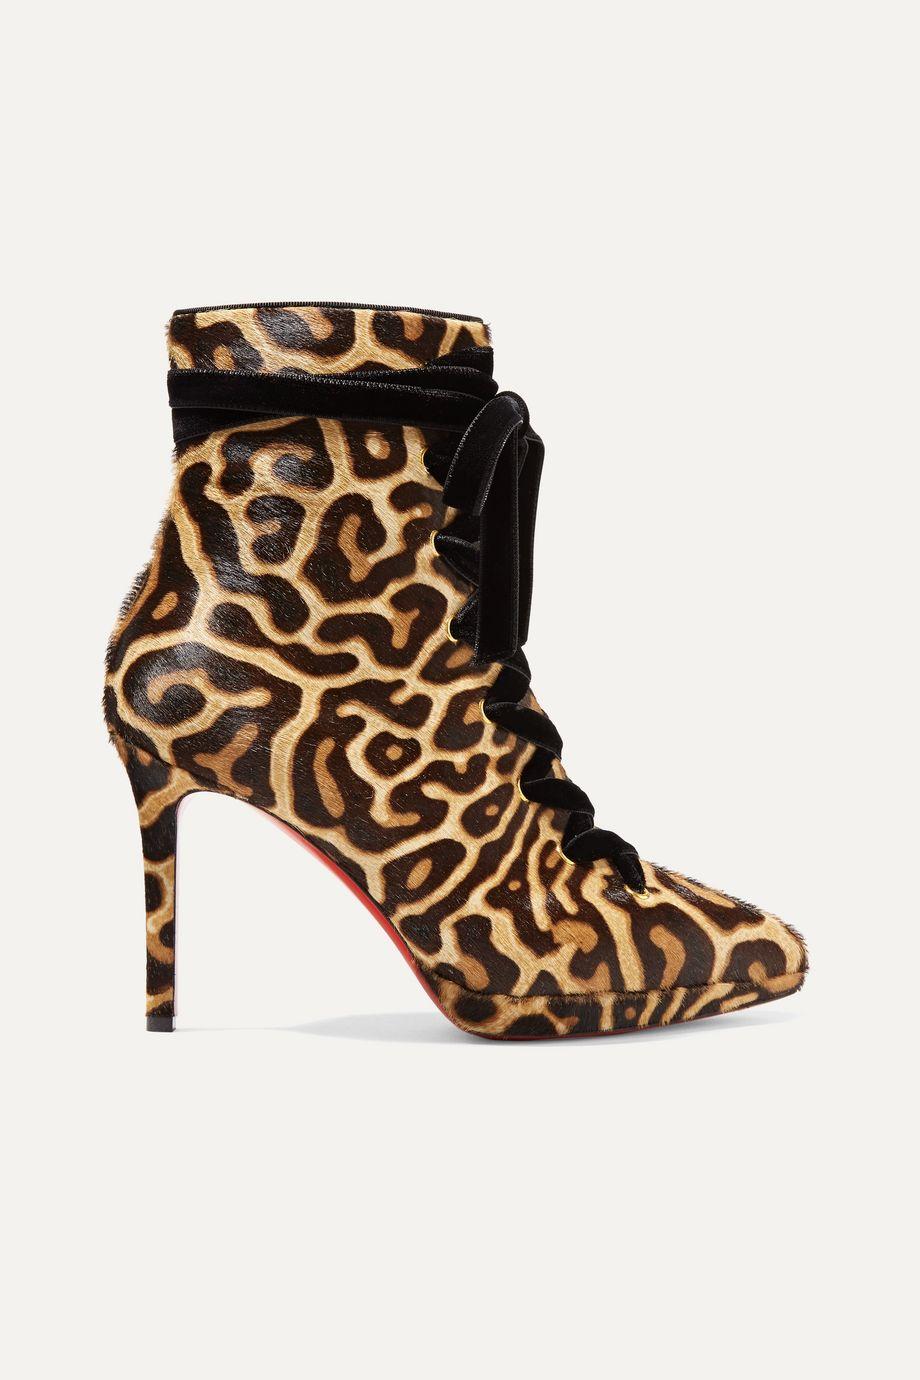 Christian Louboutin Circus Nana 100 lace-up leopard-print calf hair platform ankle boots